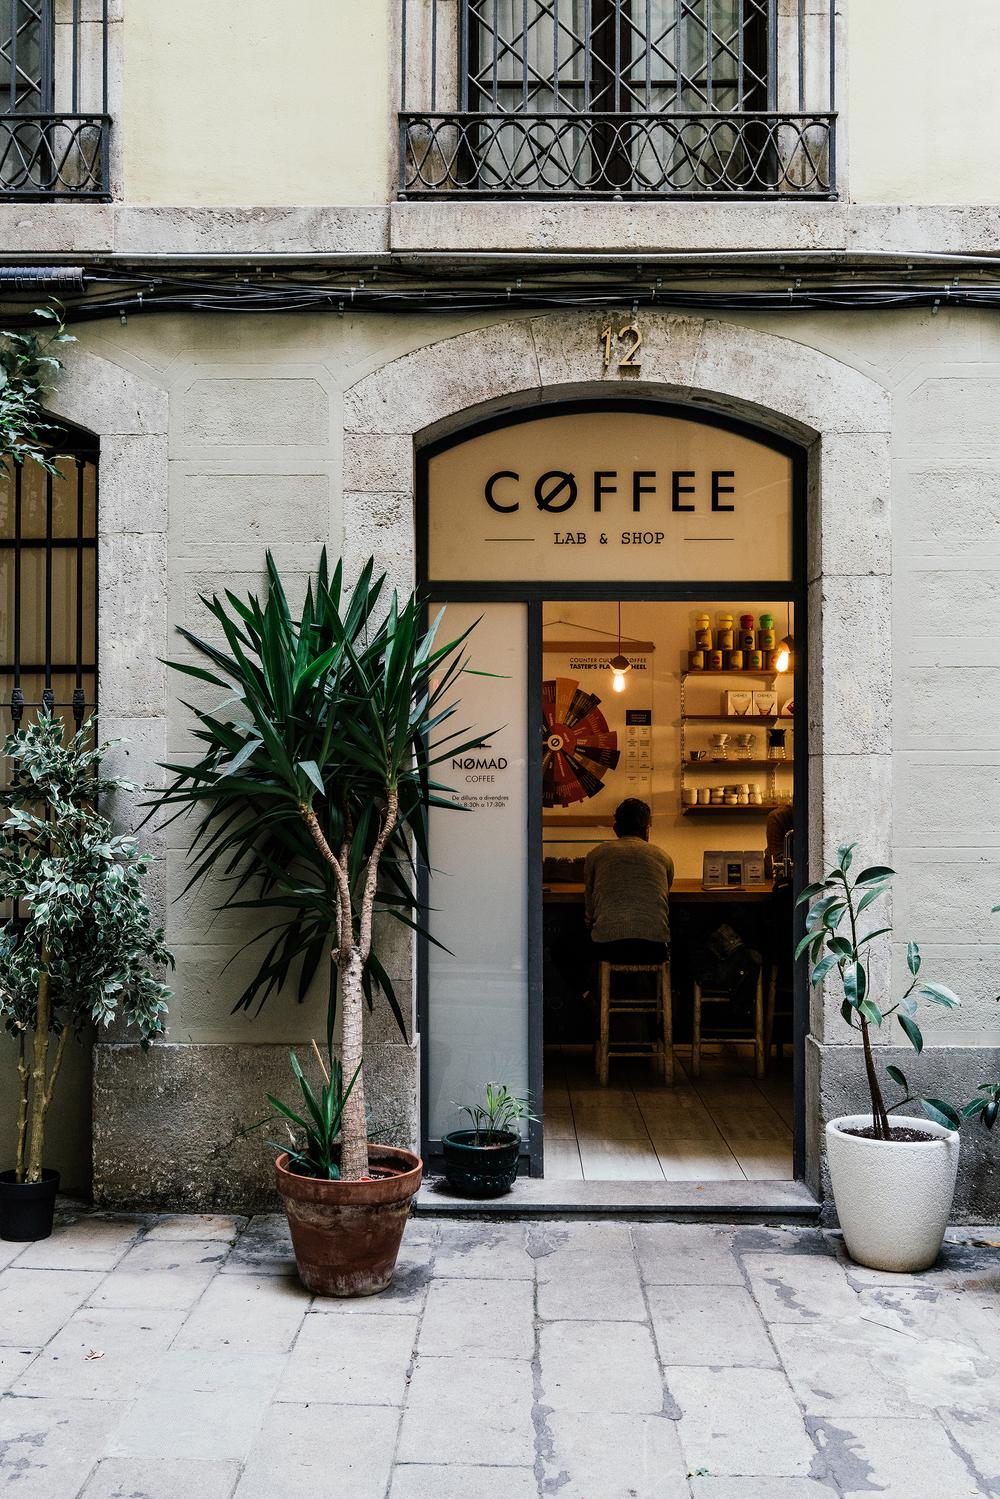 Nømad Coffee Lab & Shop